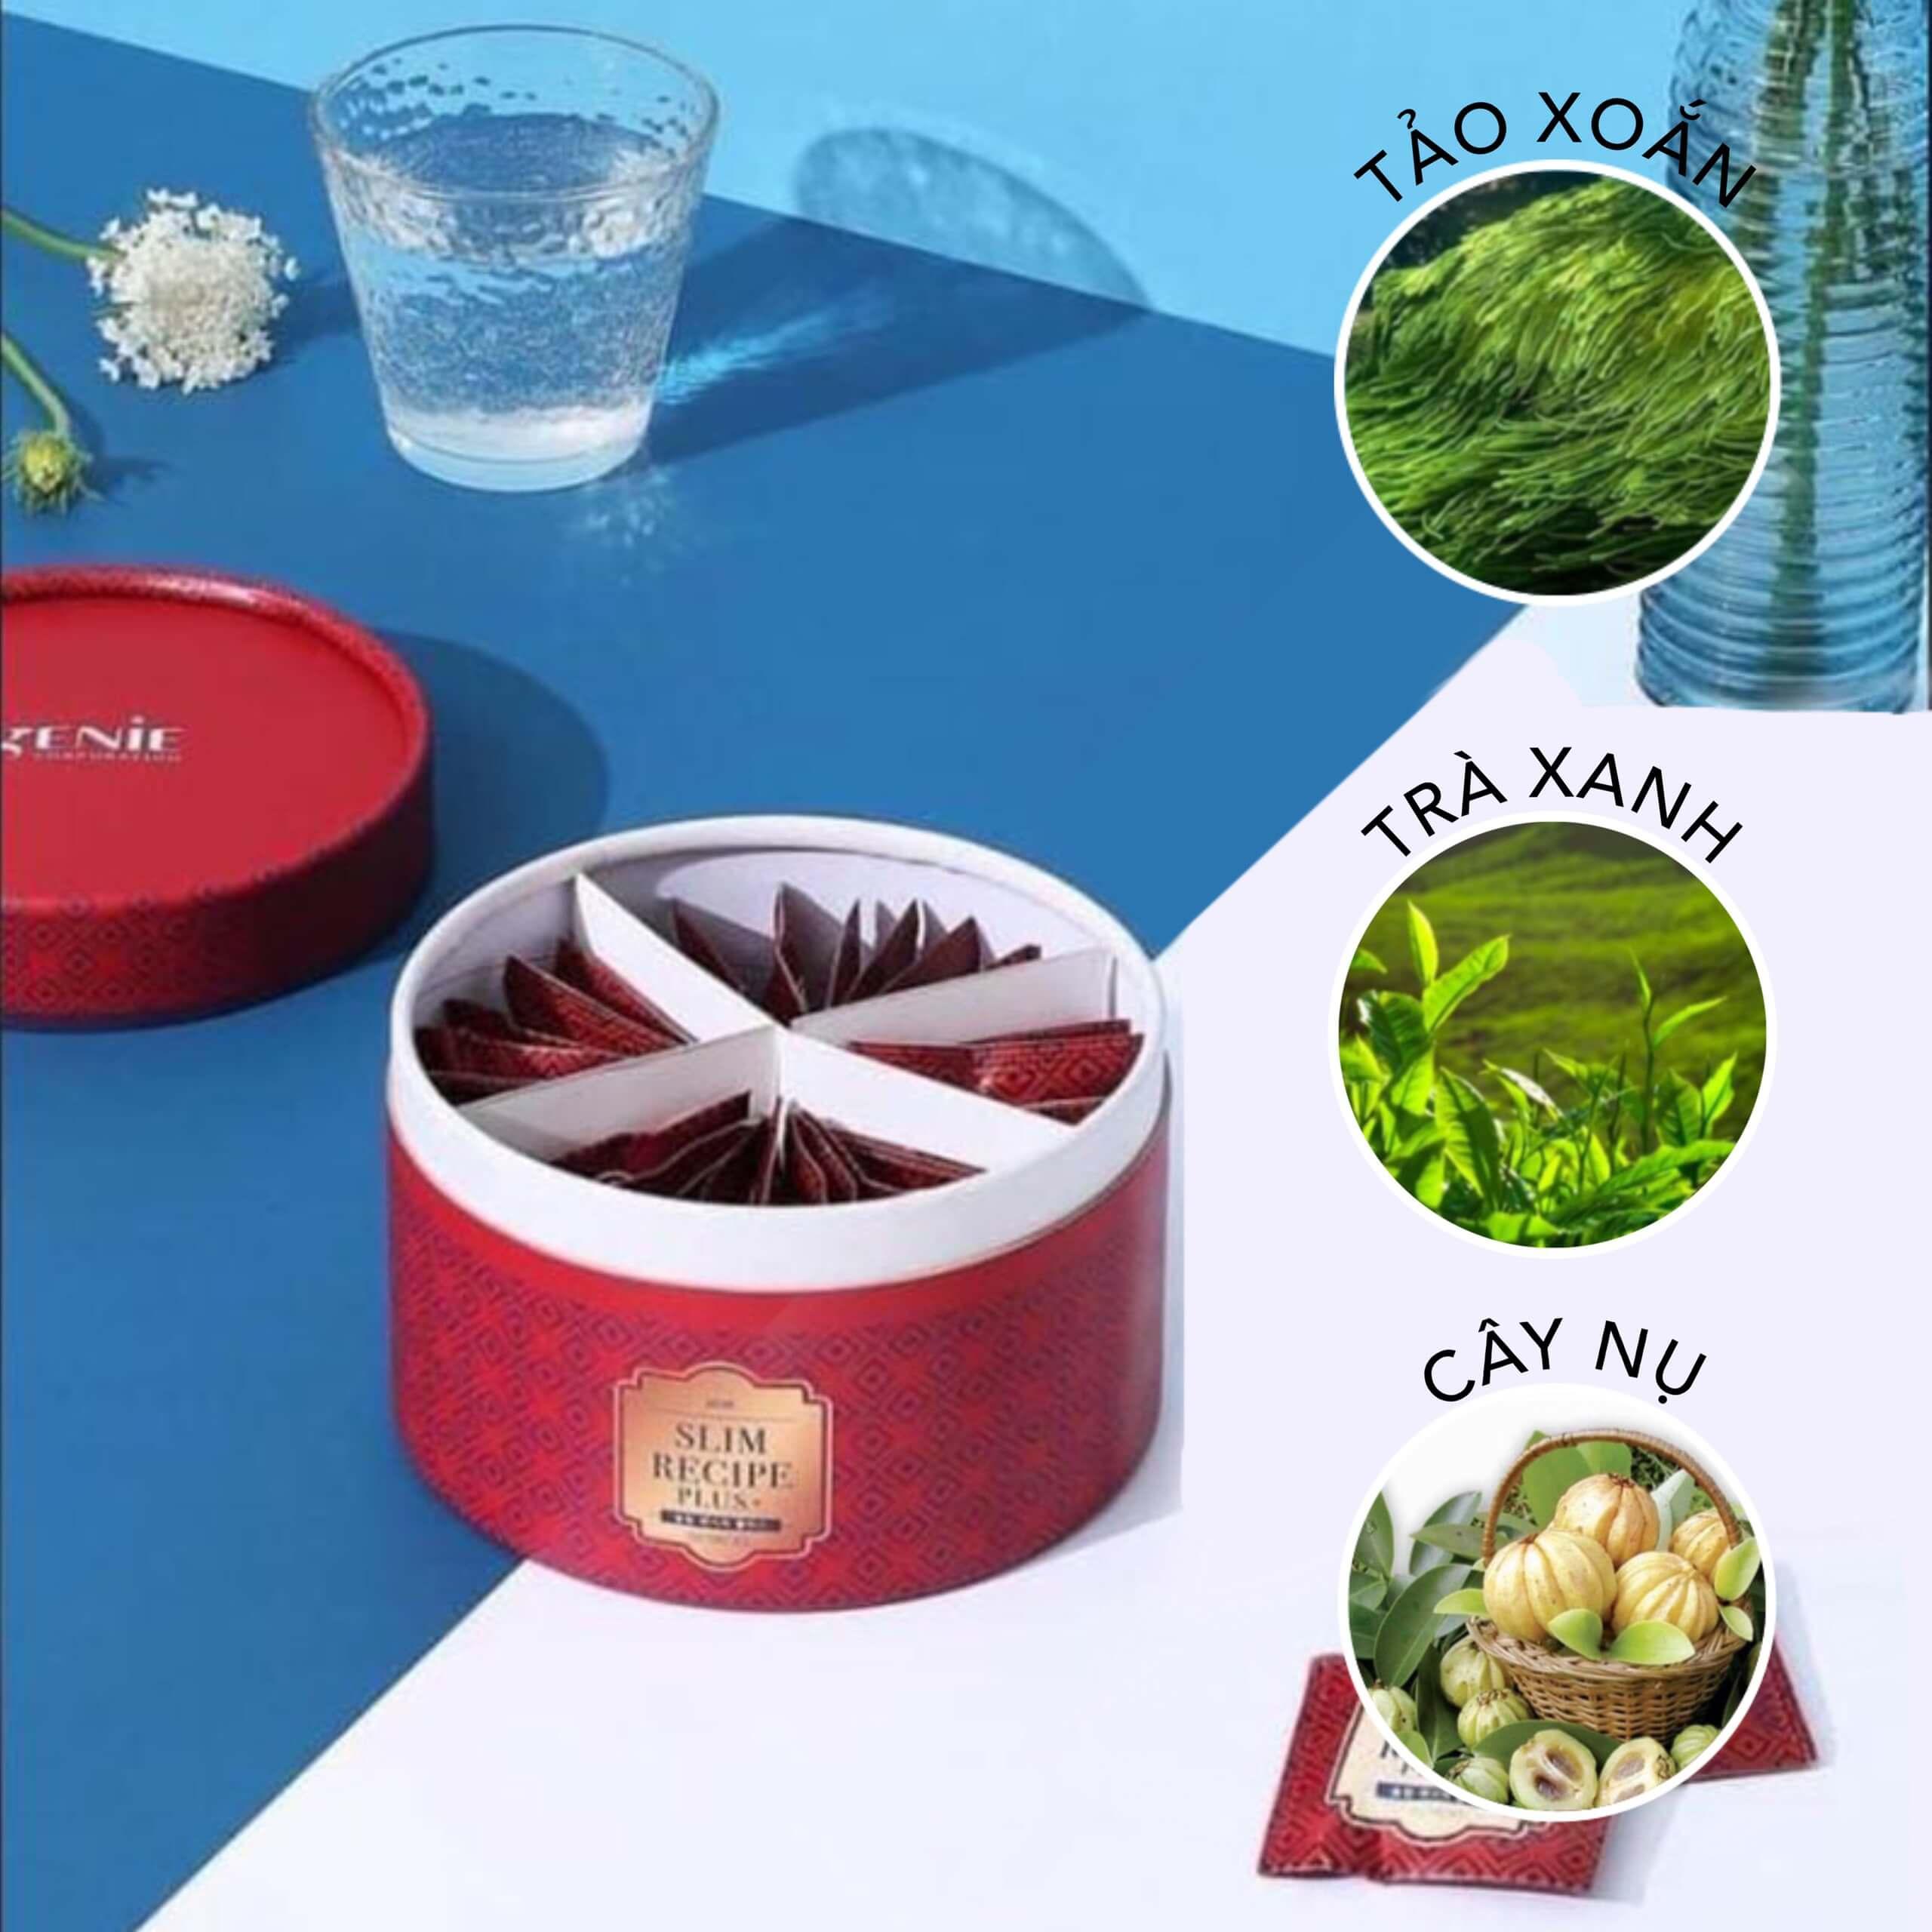 Viên uống giảm cân tảo xoắn Slim Recipe Plus + Genie